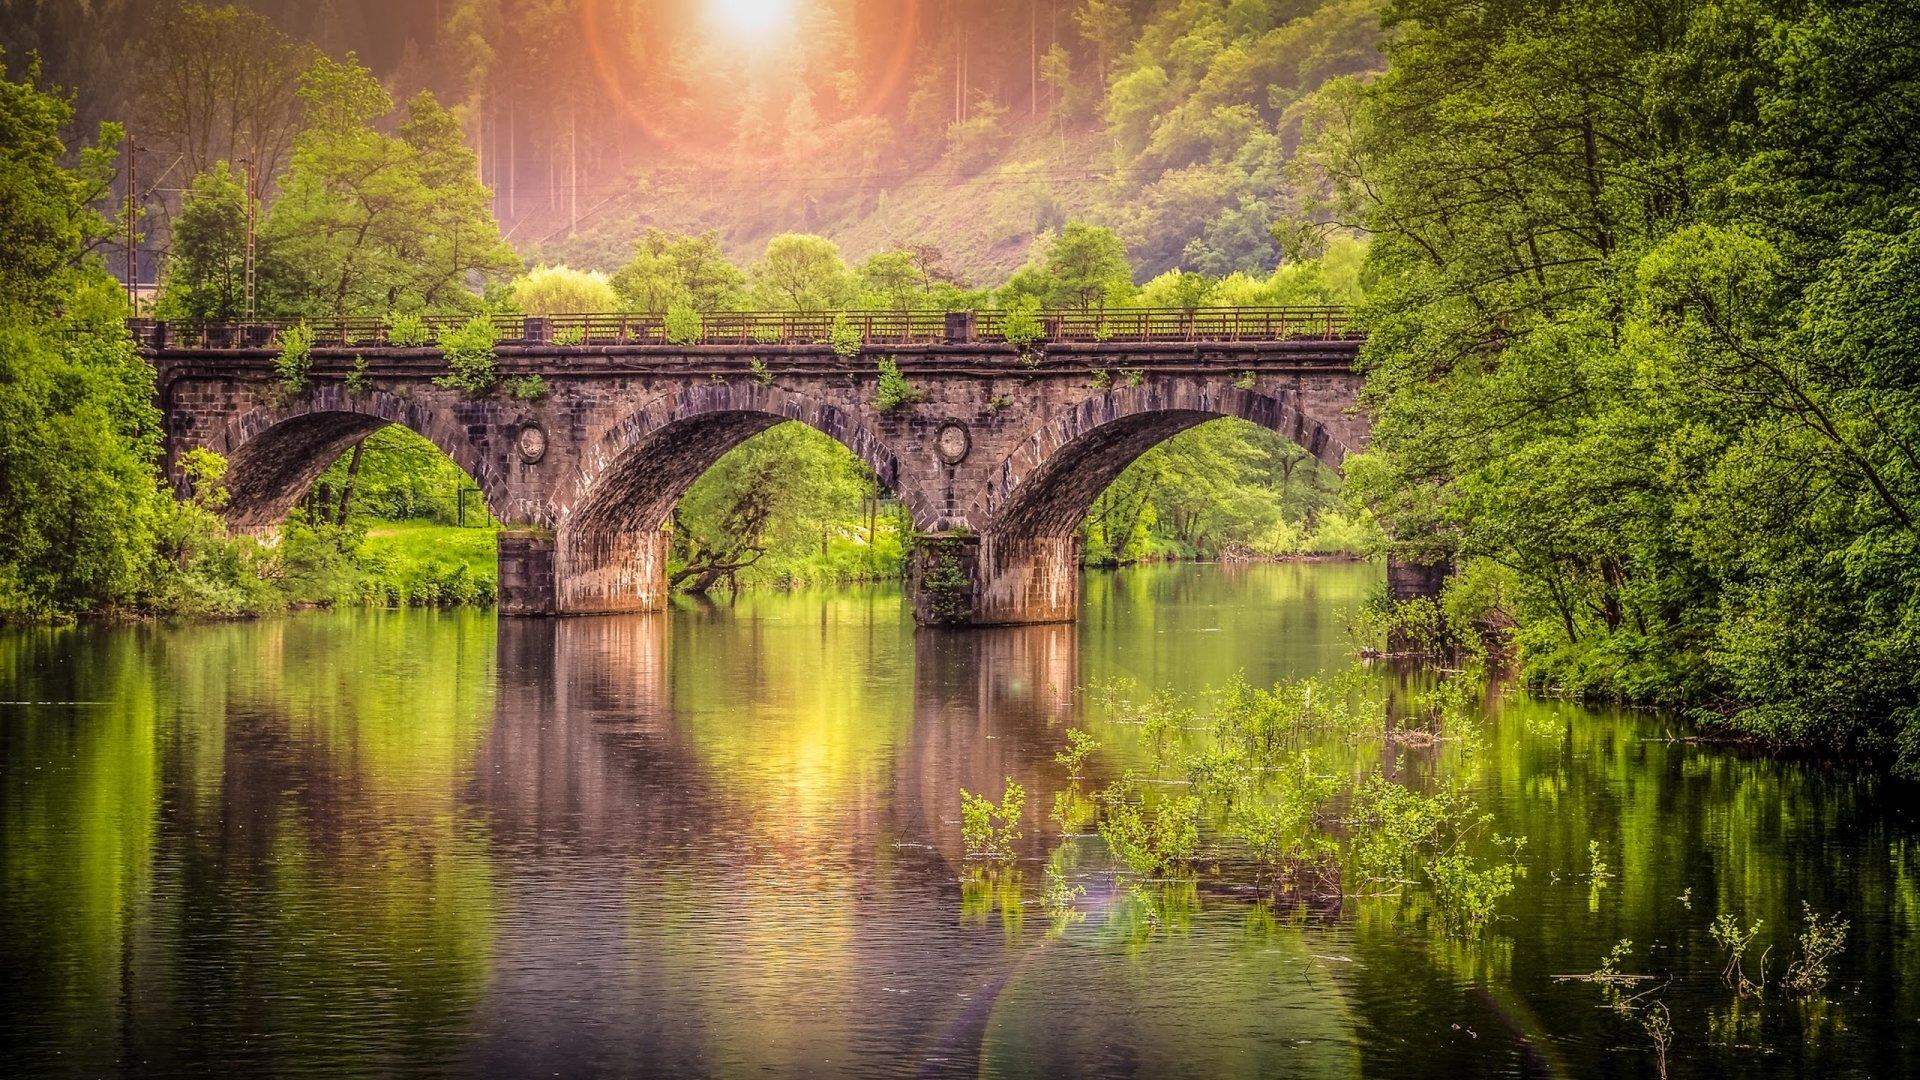 Forest Bridge Hd Wallpaper Background Image 2560x1440